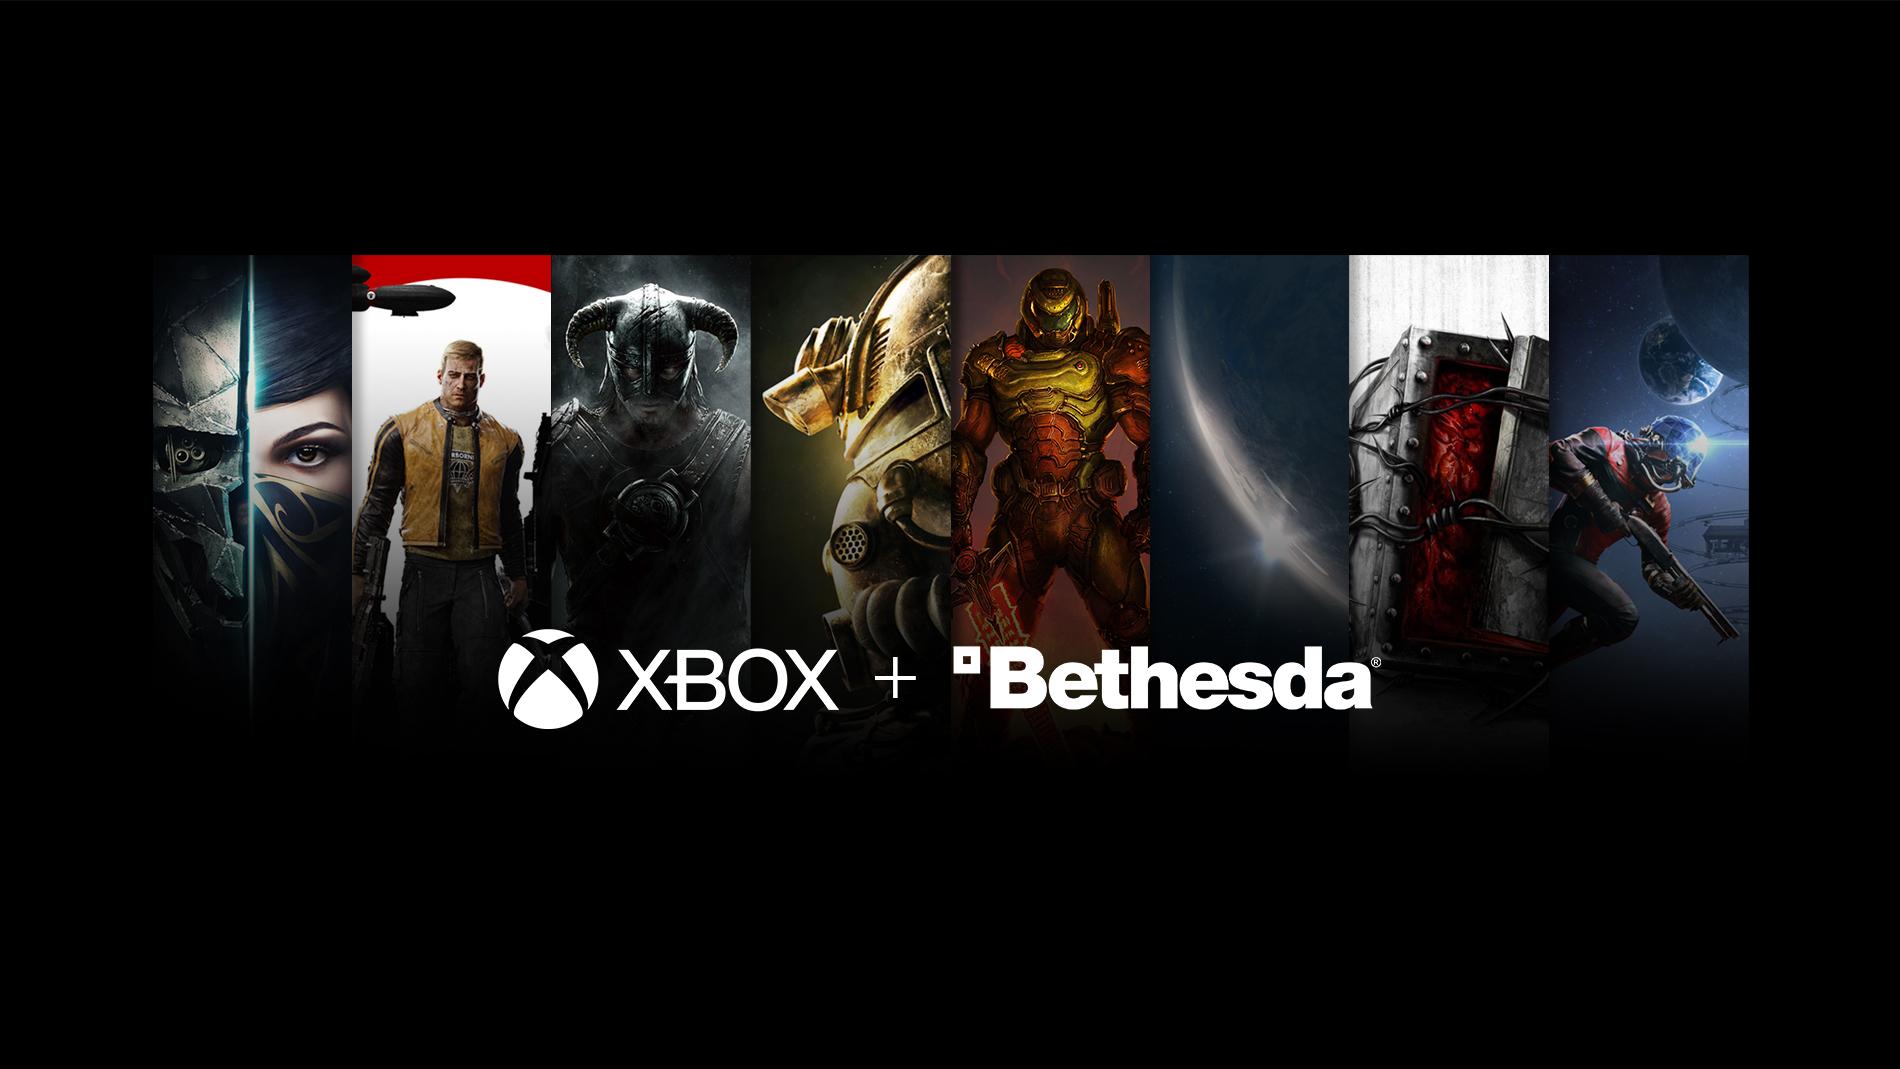 Xbox + Bethesda